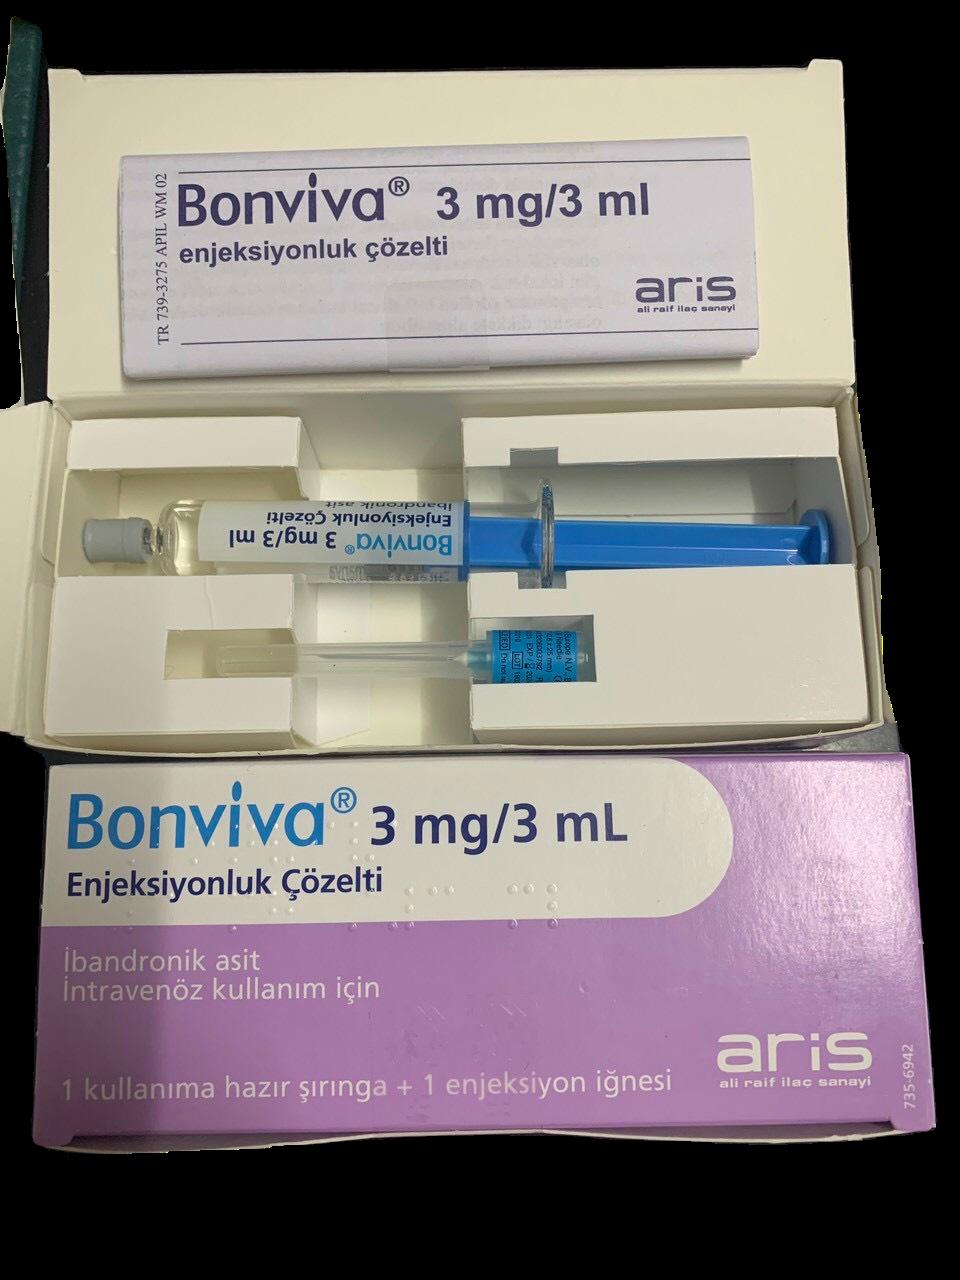 Bonviva 3mg/3ml (Ibandronic Acid) Hộp 1 ống